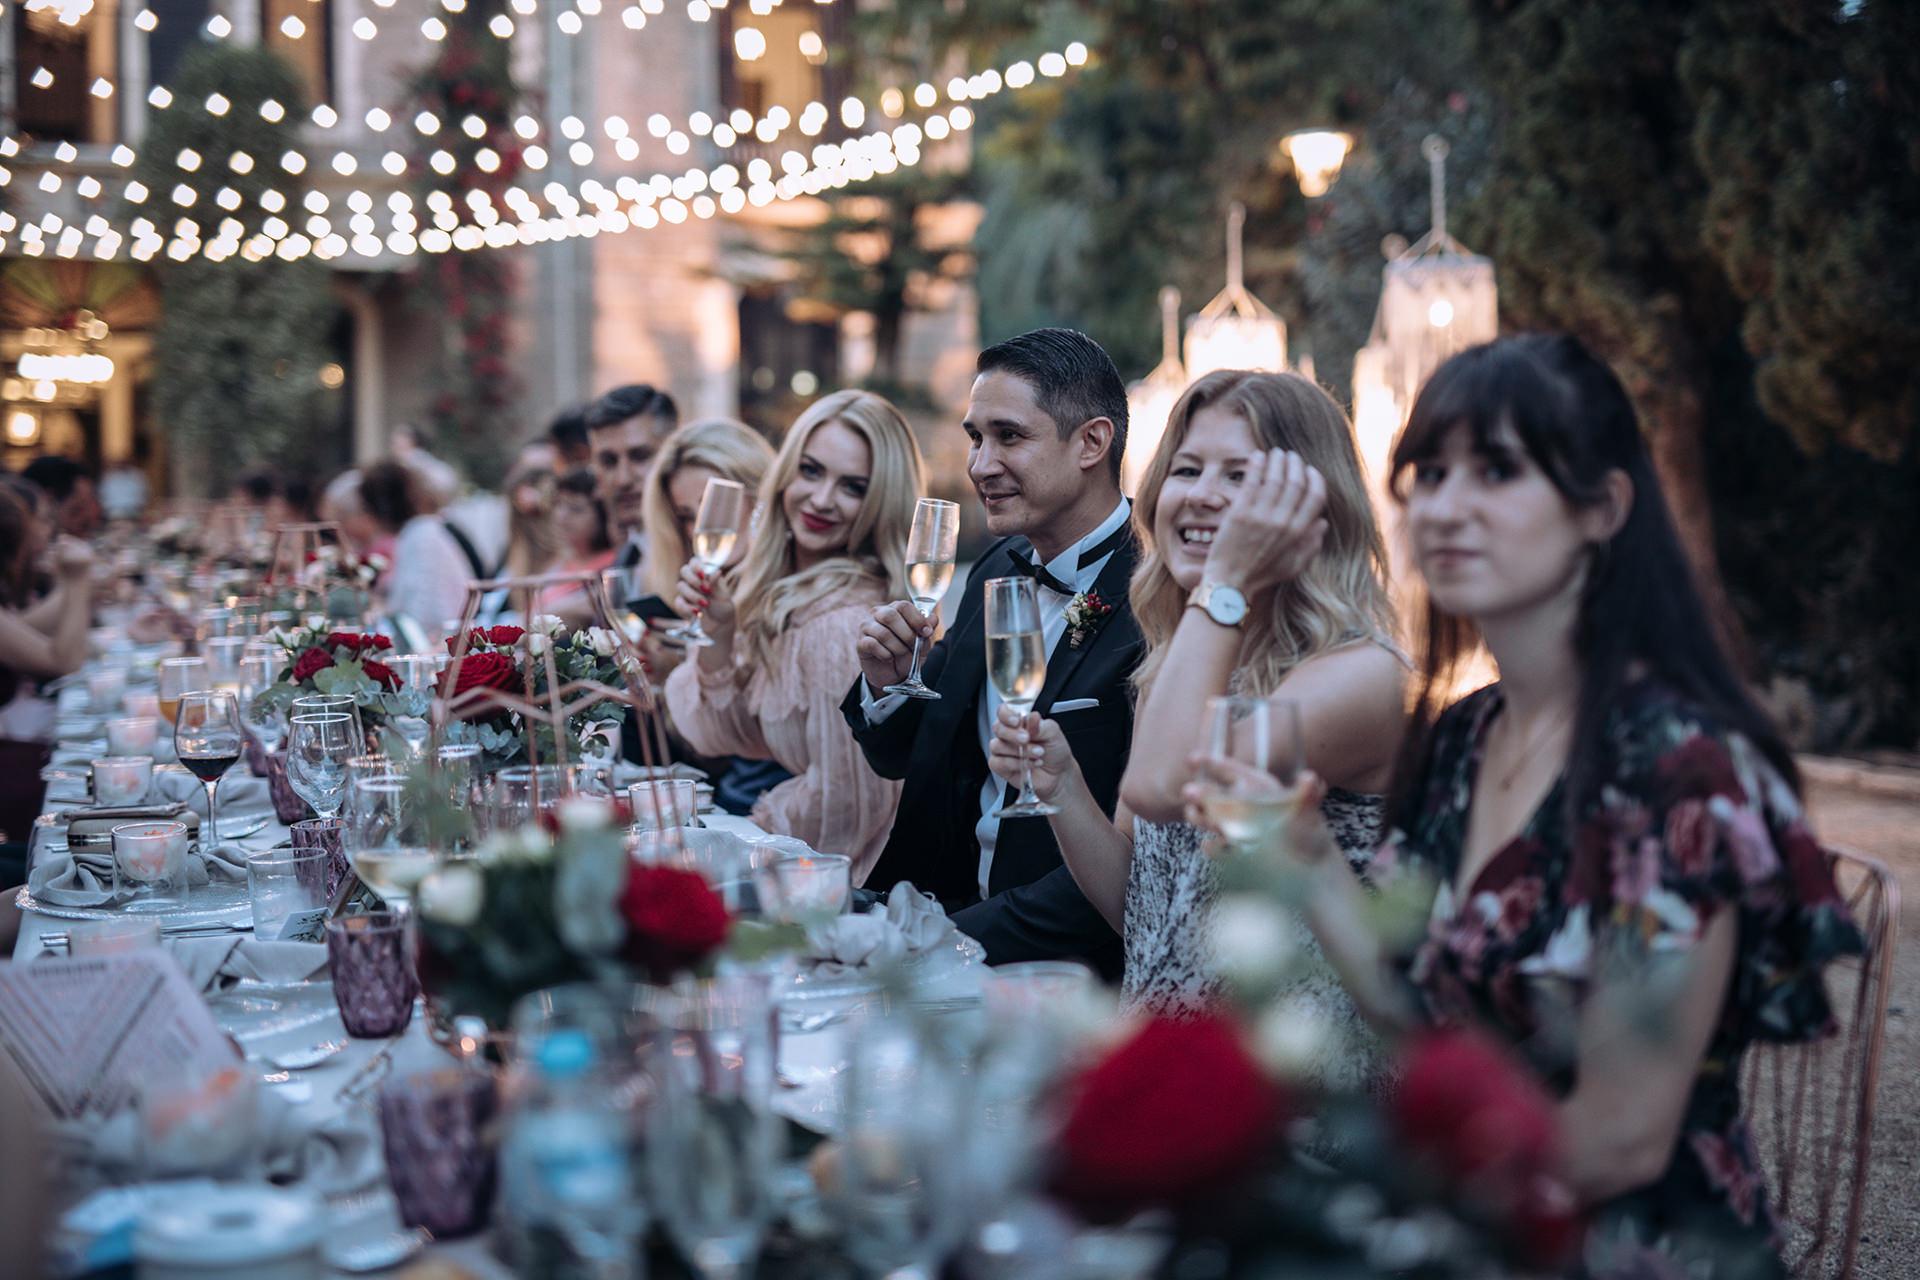 Bröllop_destinationwedding_2G5A5426.jpg